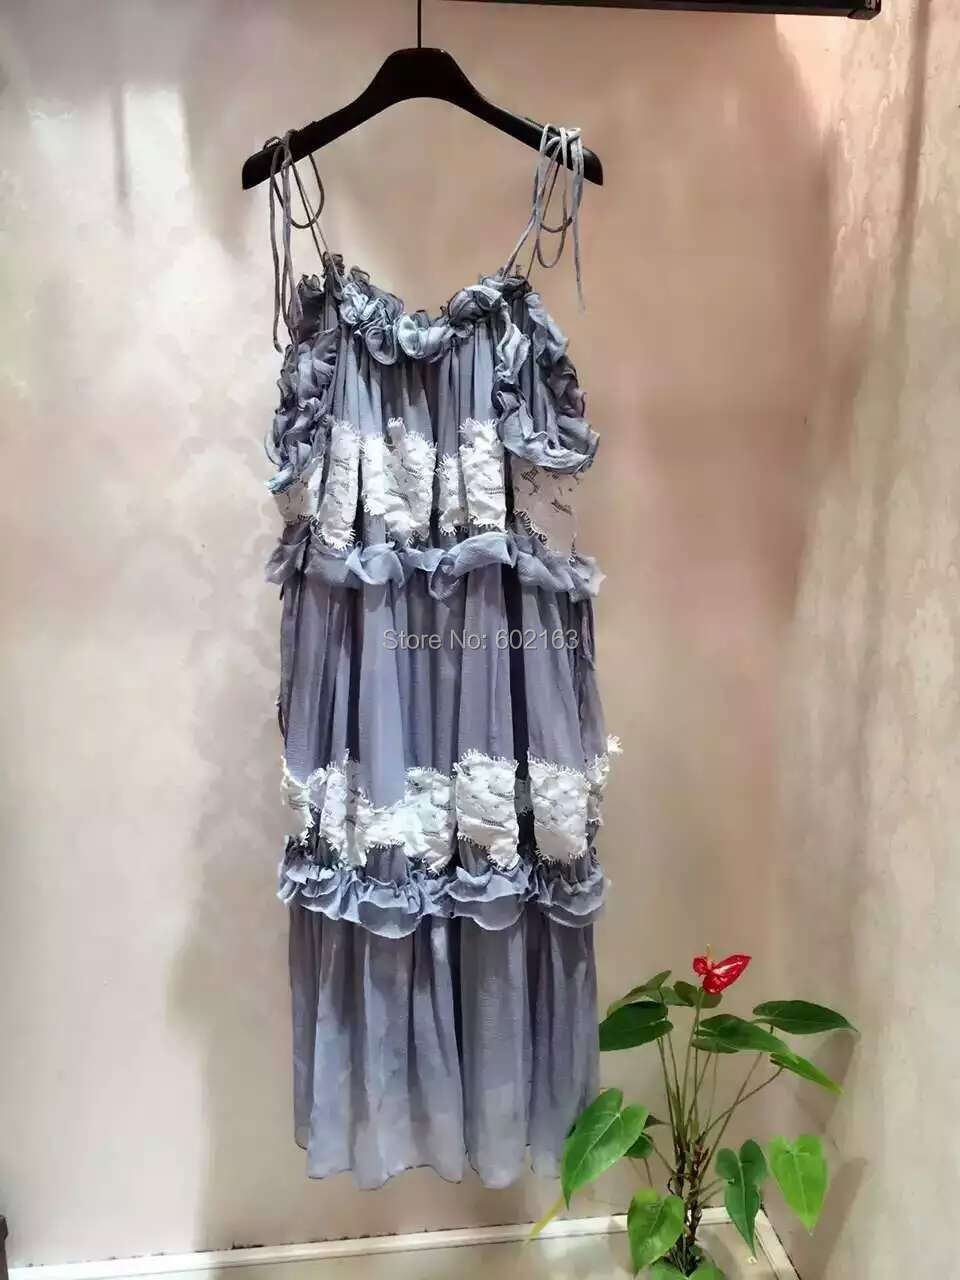 2016 Spring Runway Fashion New Style Summer Dresses Spaghetti Strap Appliques Ruffles Mini Dress Women